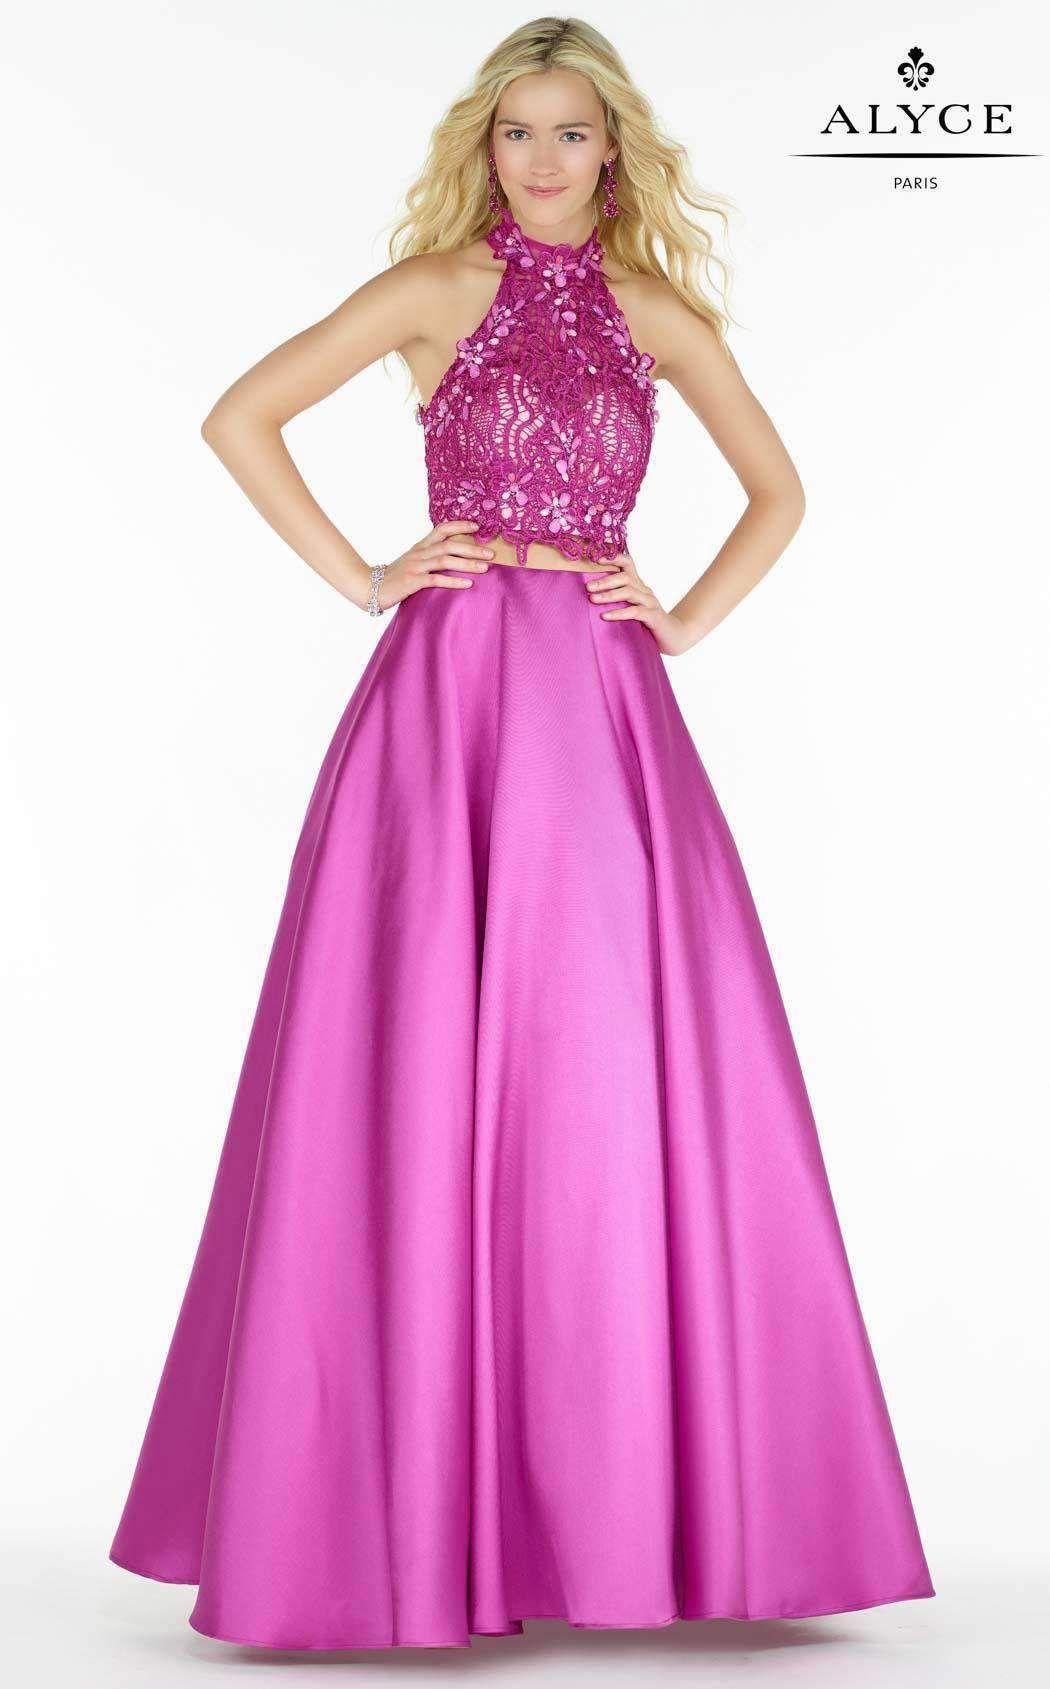 0ebdc1edea7 Alyce 6764. Alyce 6764 Pink Formal Dresses ...